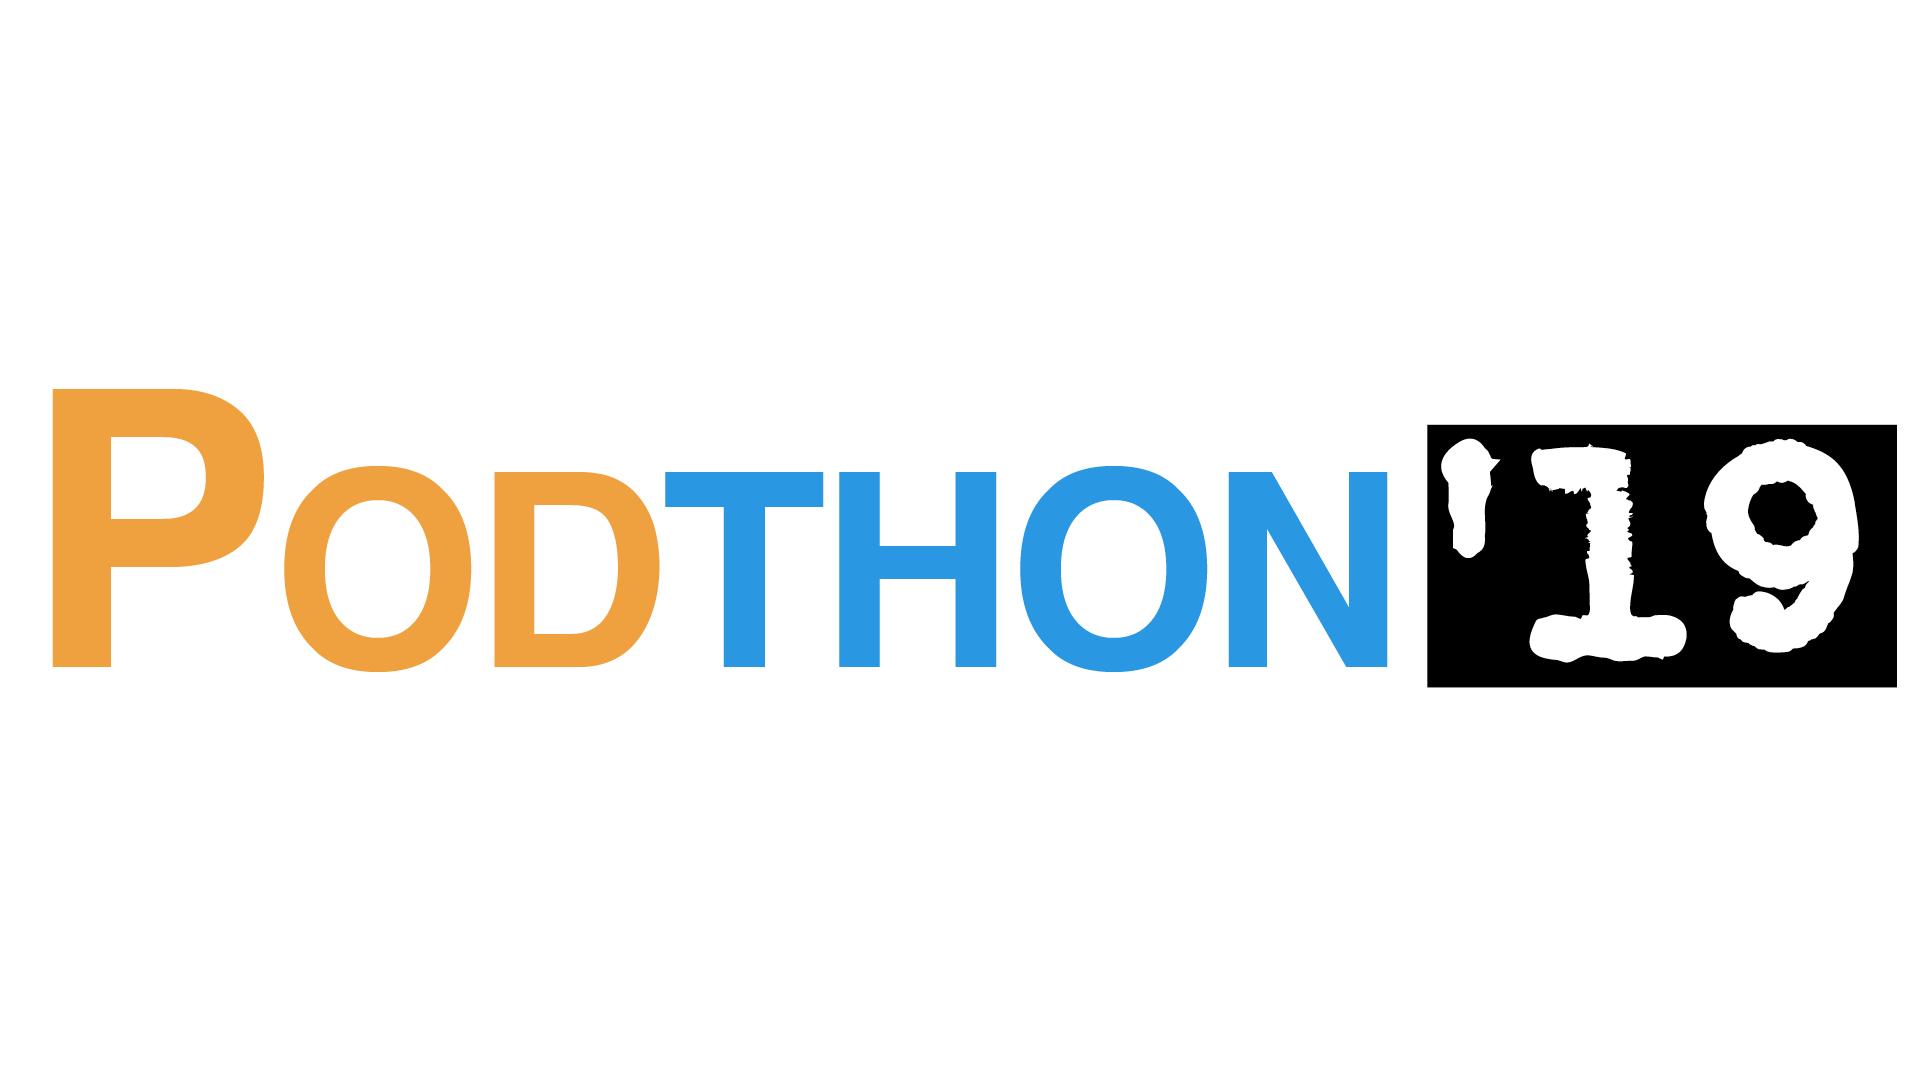 Podthon '19